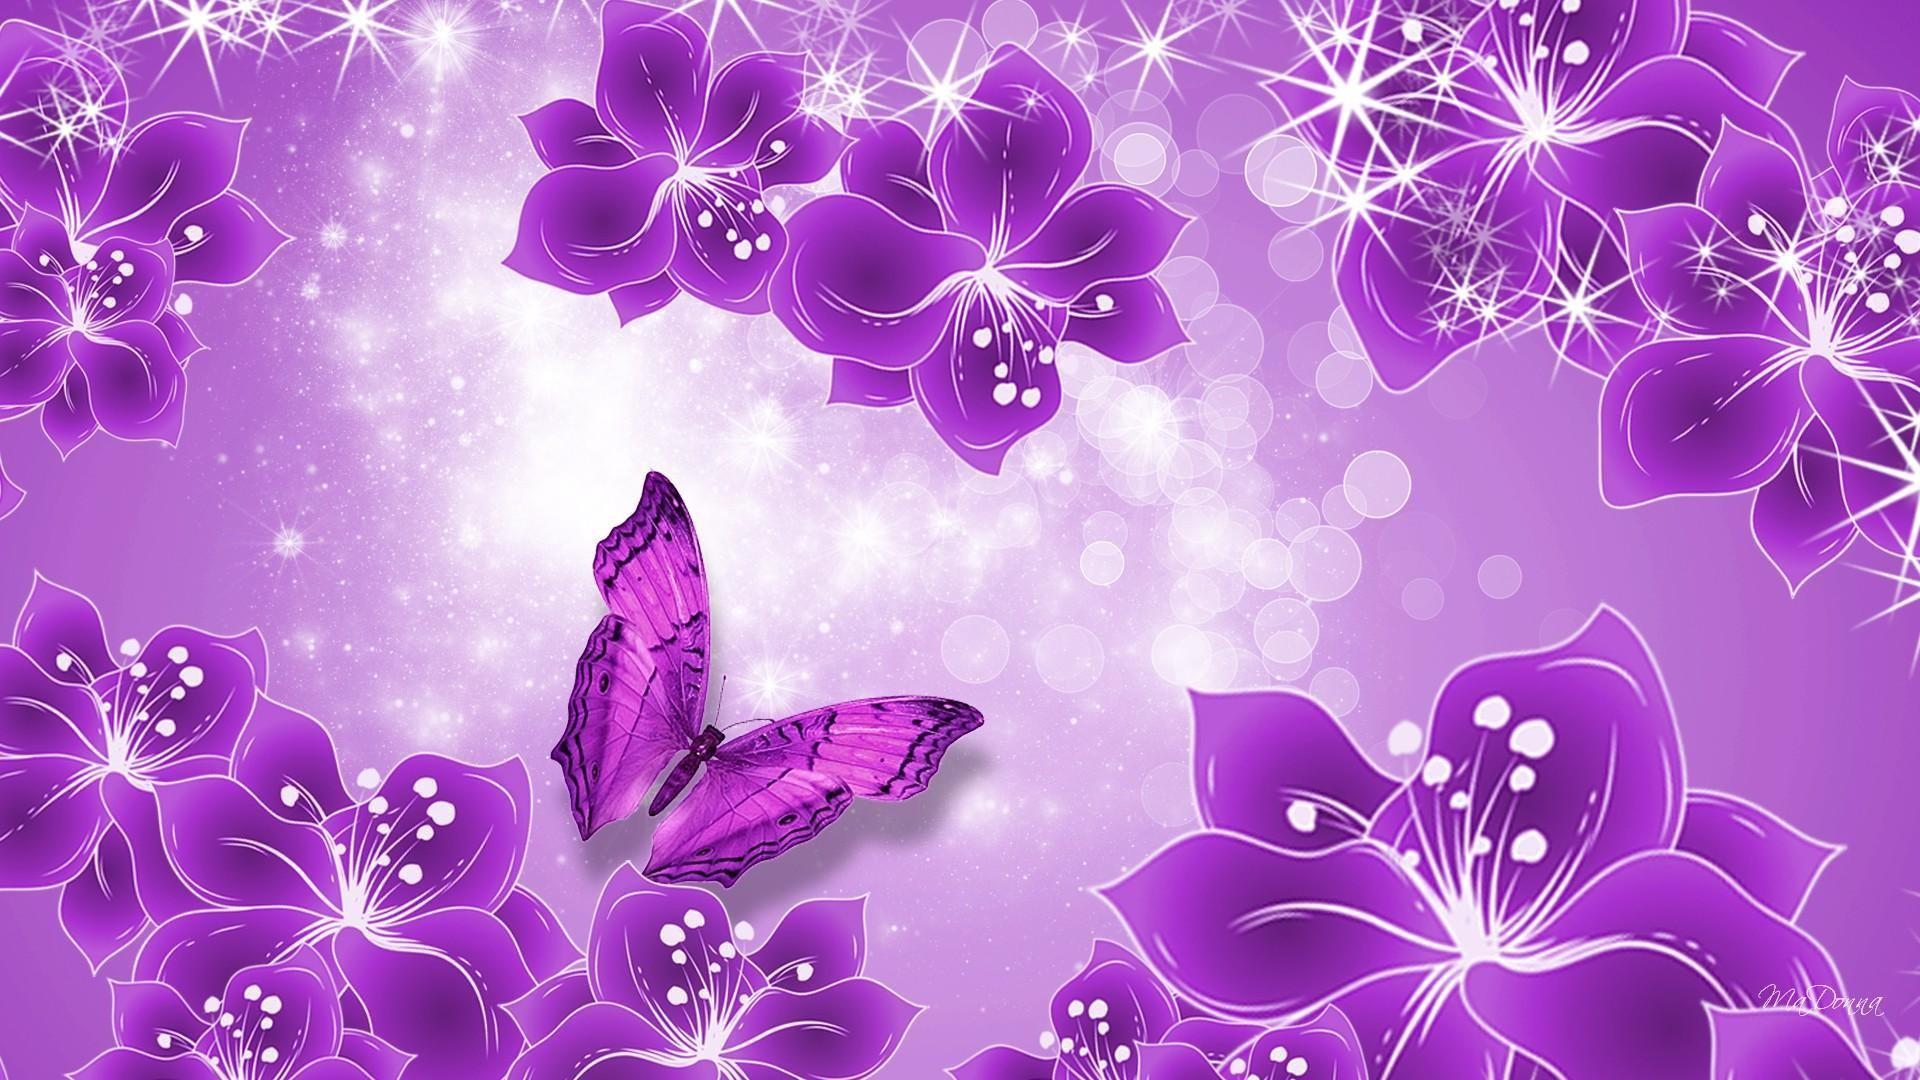 Data Src Purple Butterfly Background 1920x1080 Wallpaper Teahub Io